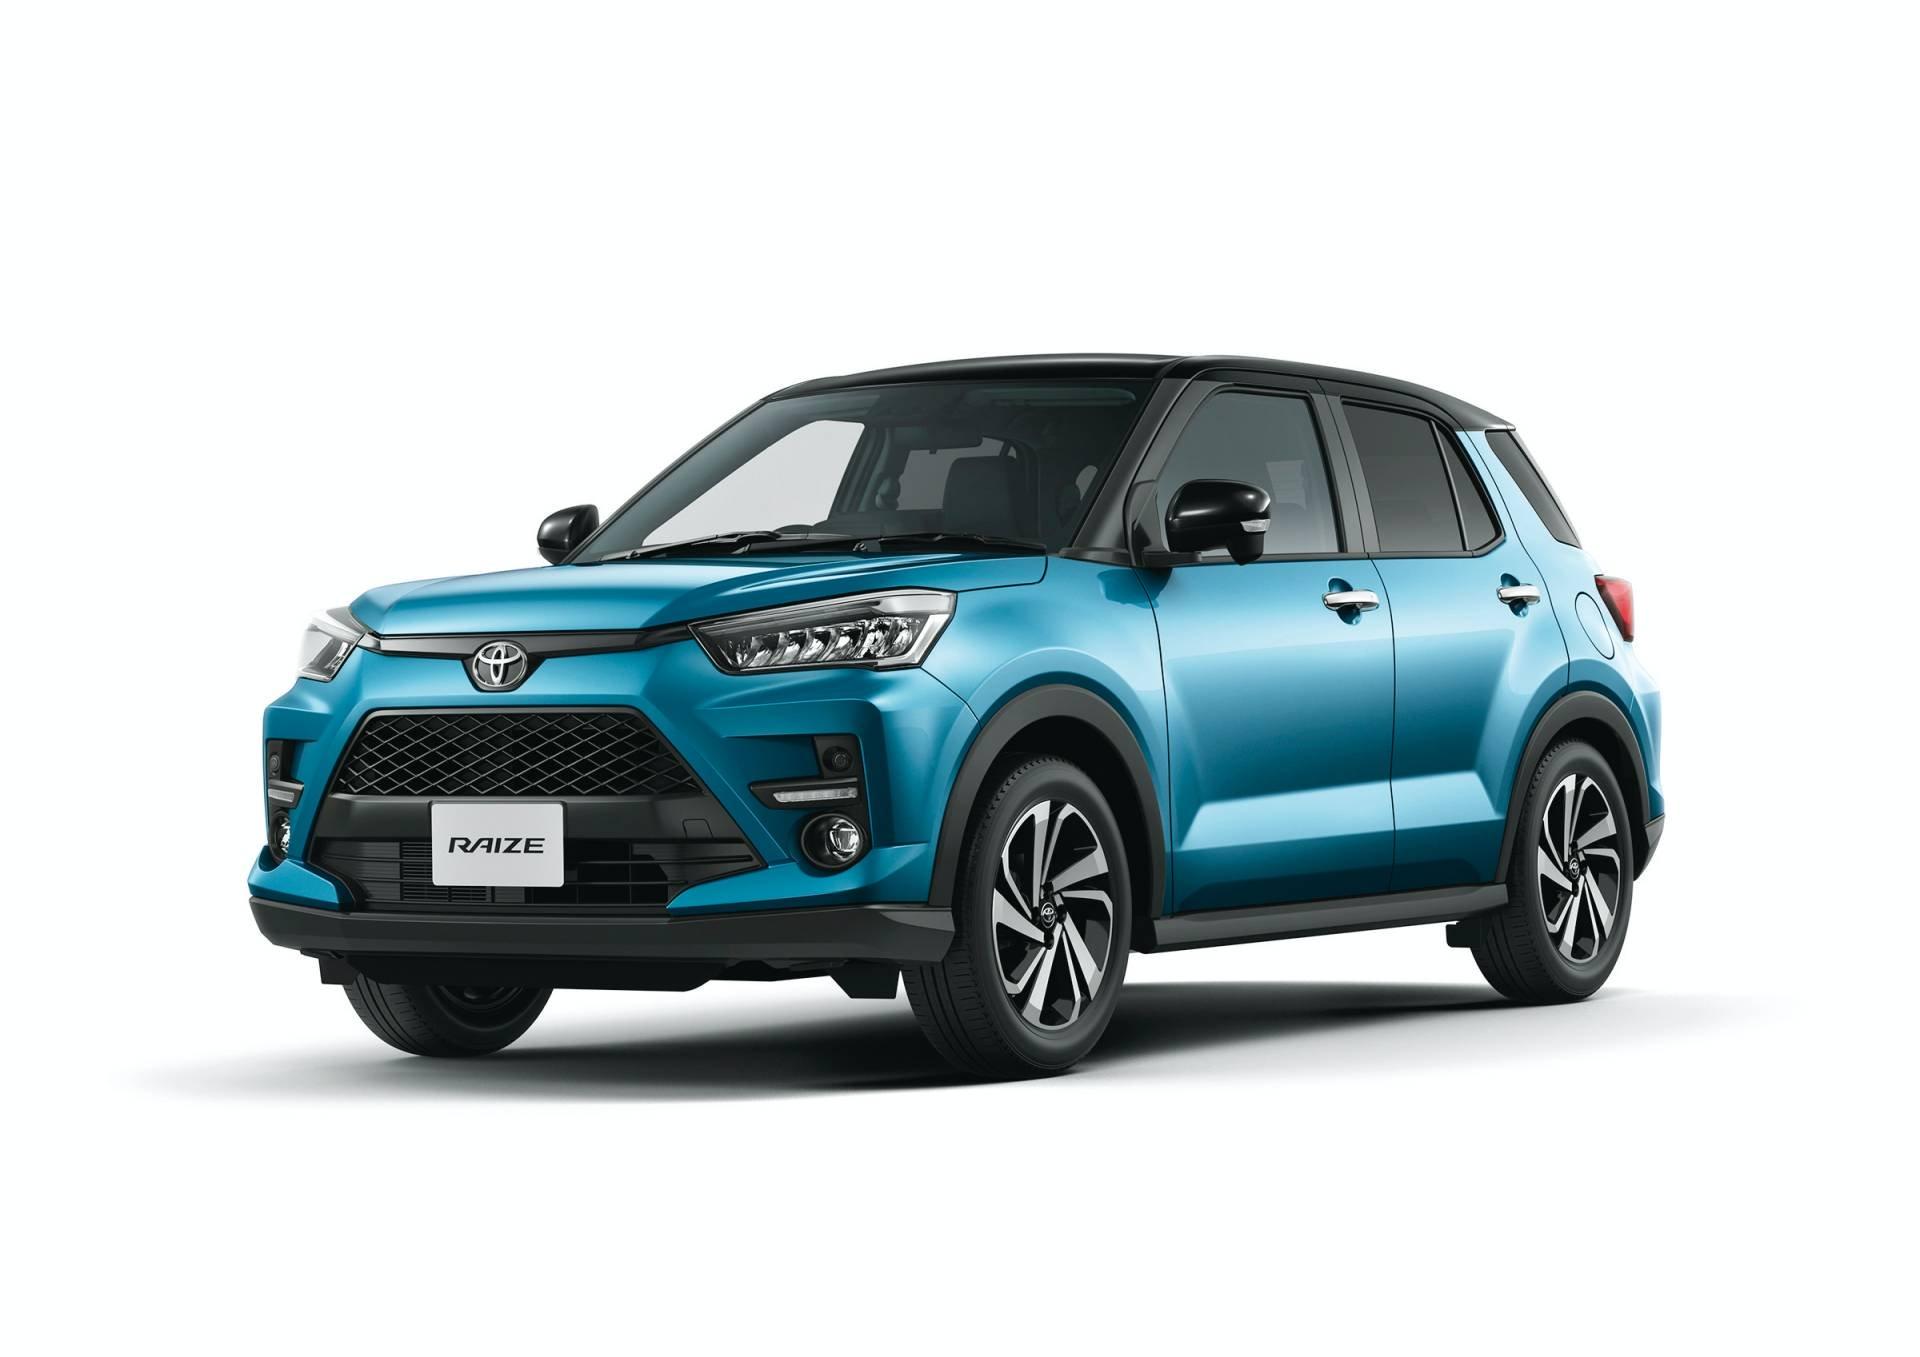 2020_Toyota_Raize_0000